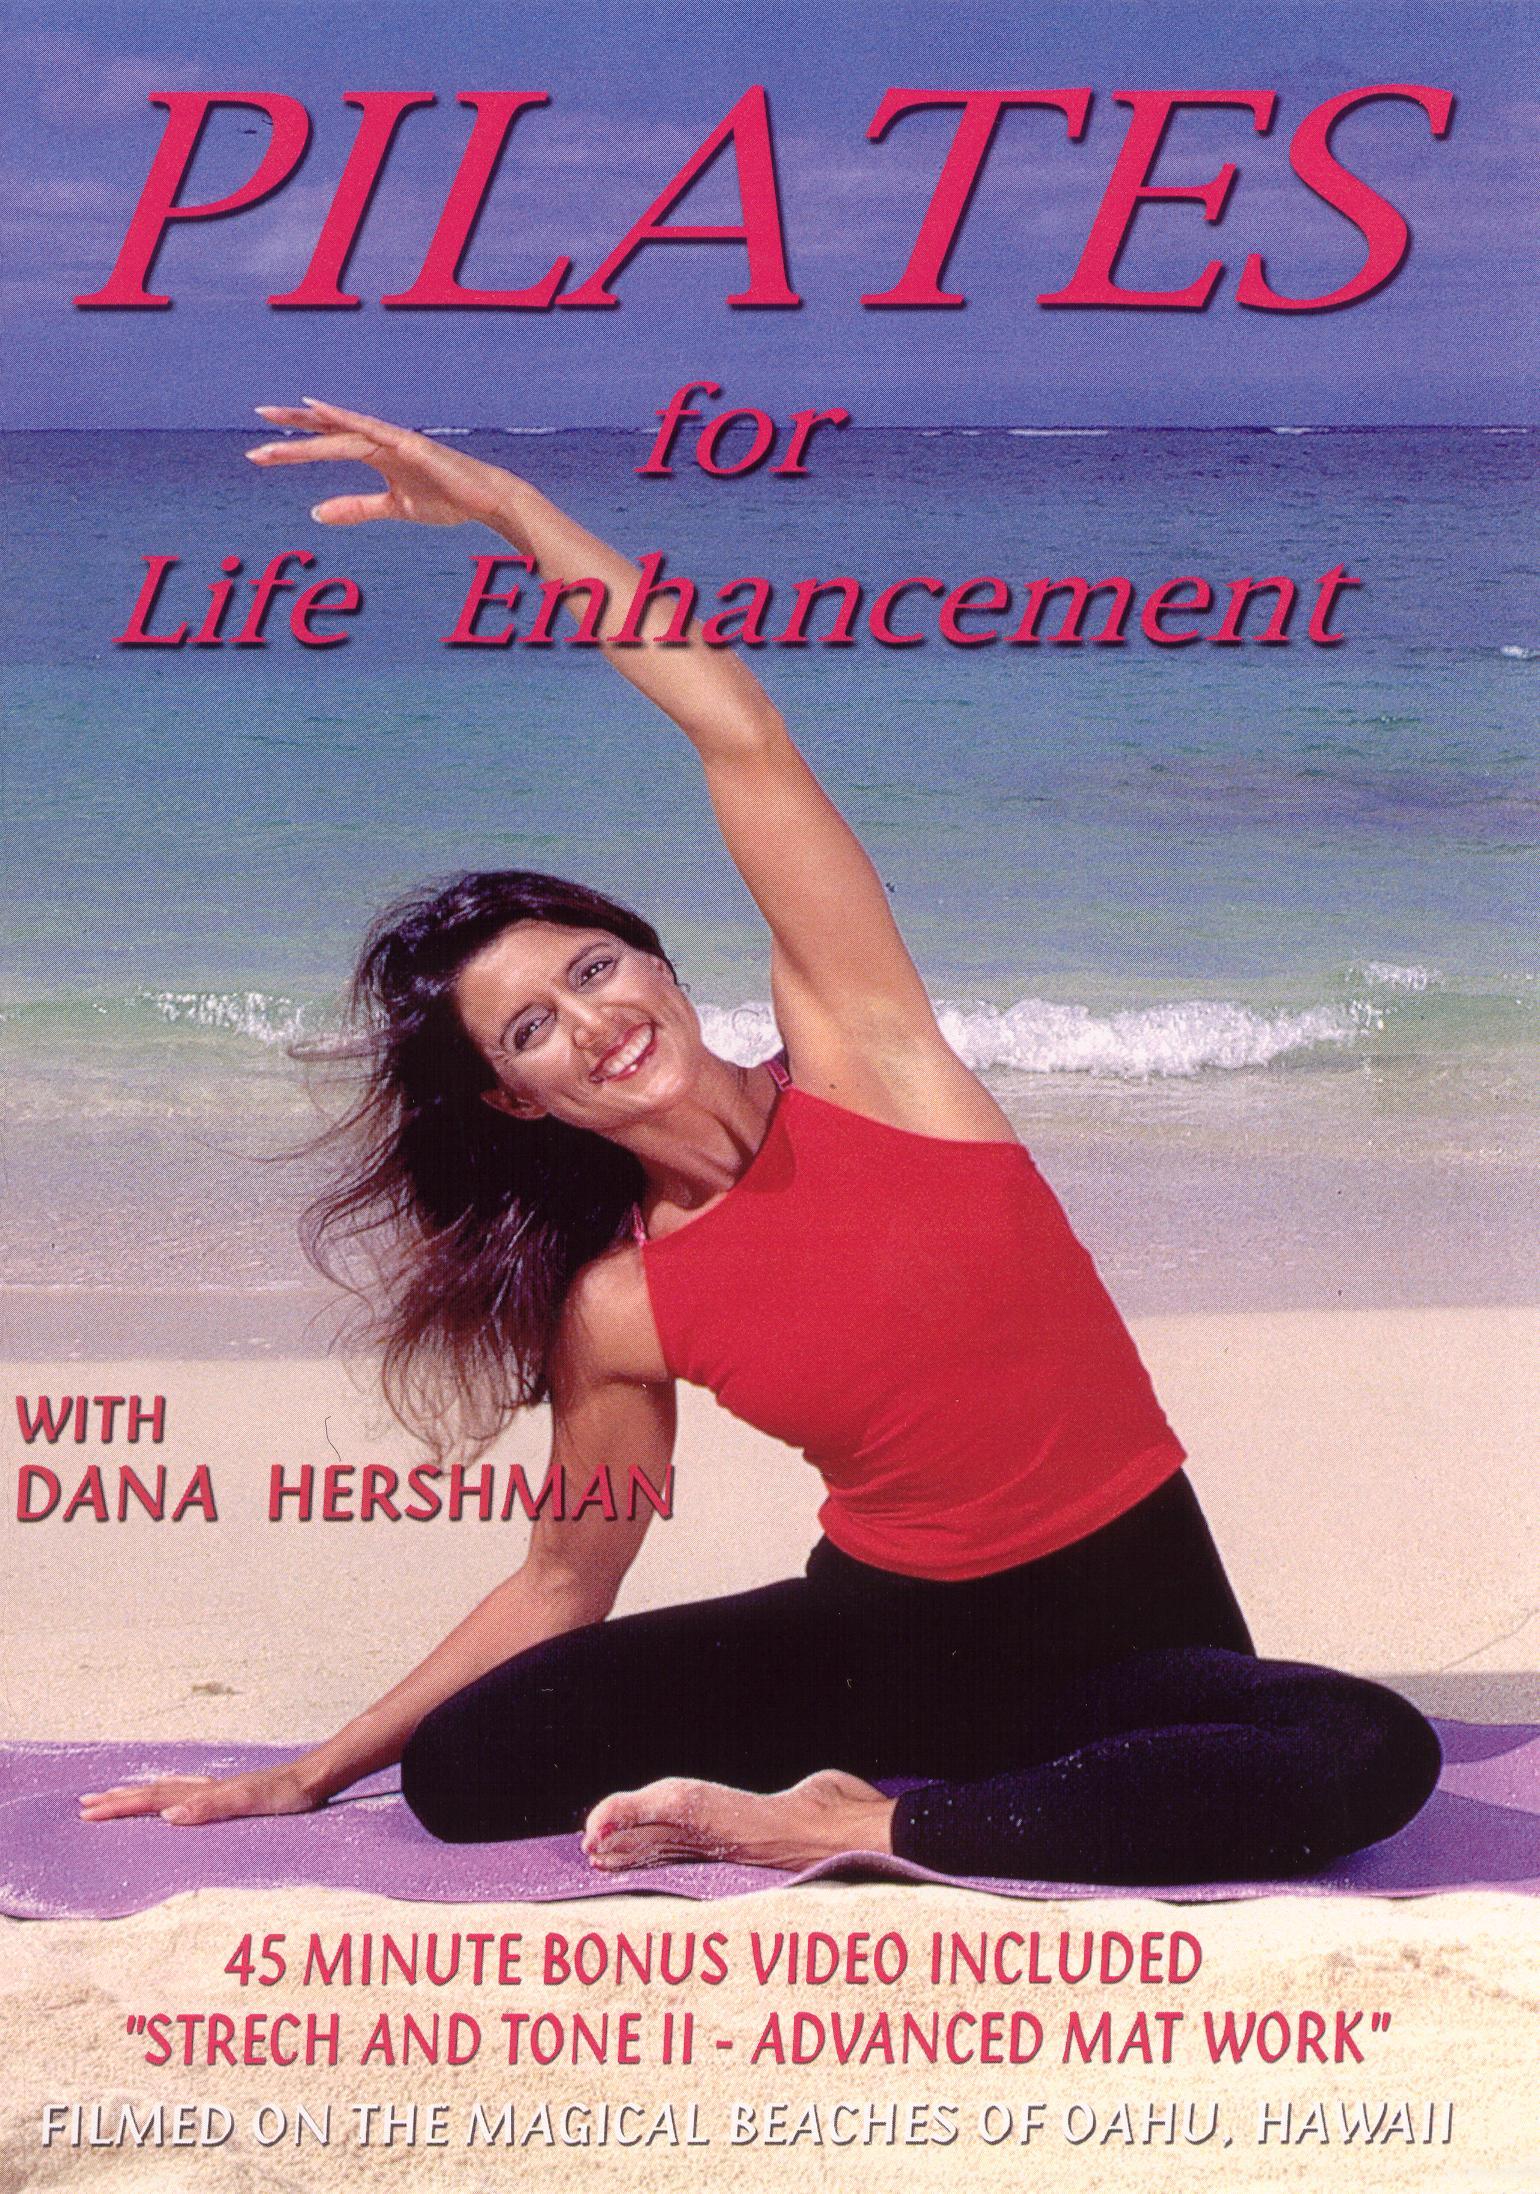 Pilates for Life Enhancement